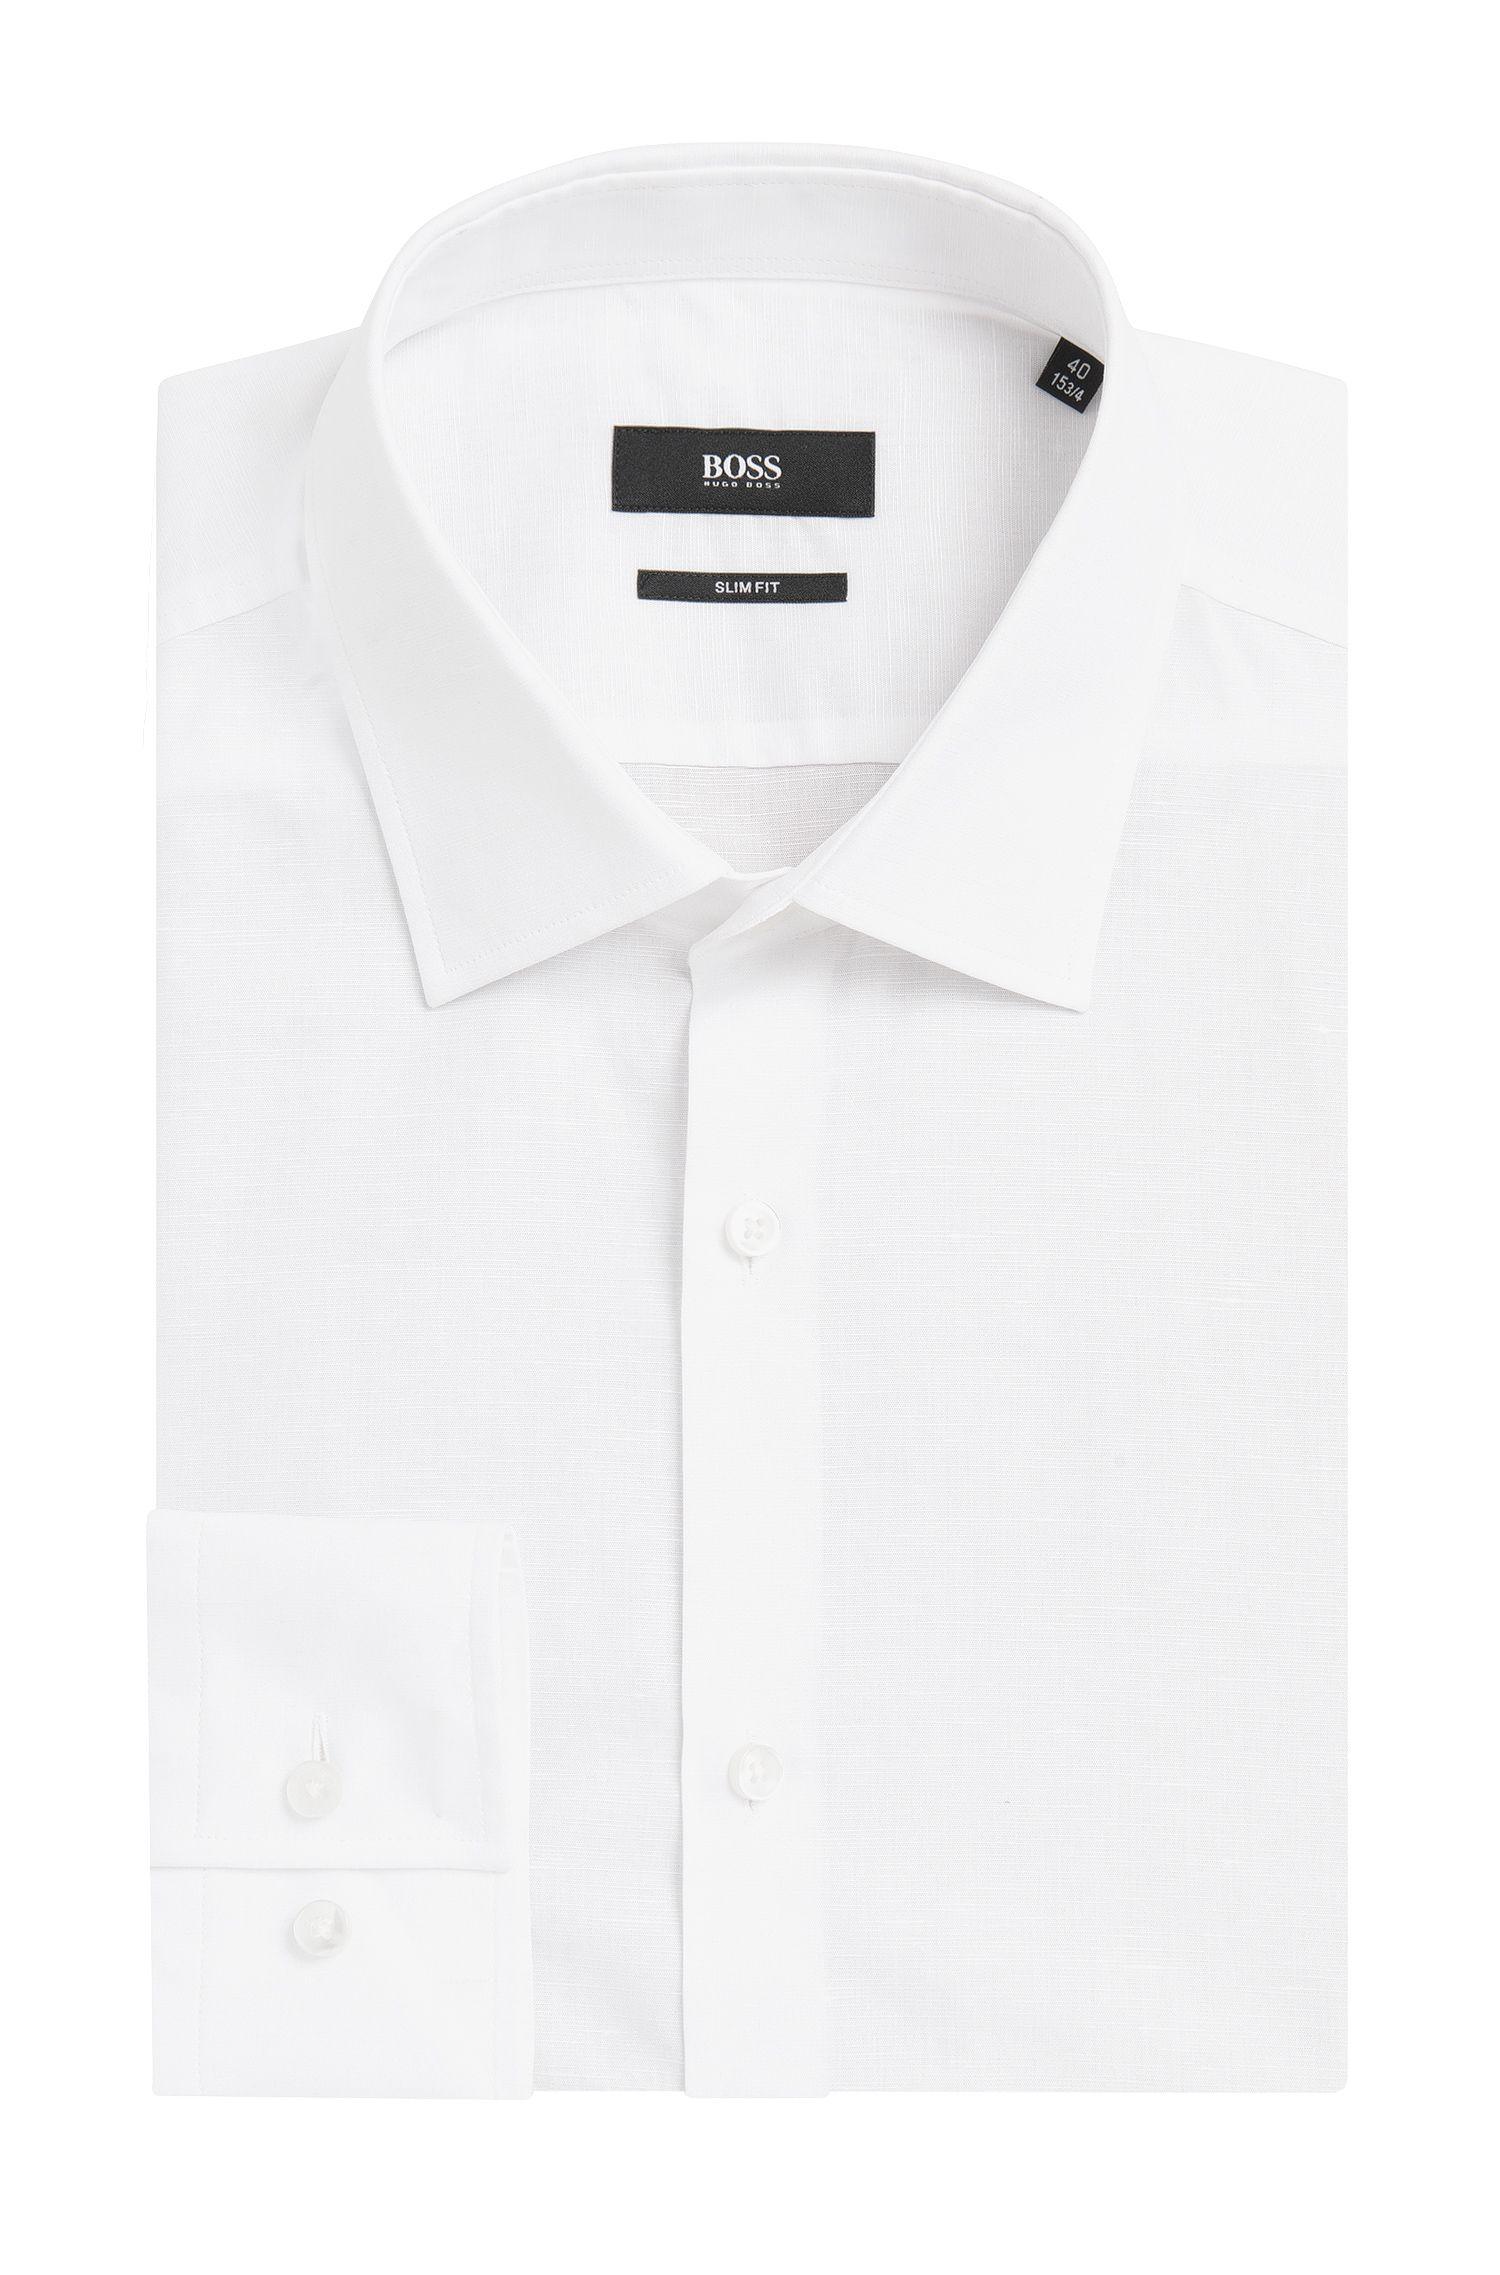 'Jenno'   Slim Fit, Italian Cotton Linen Dress Shirt